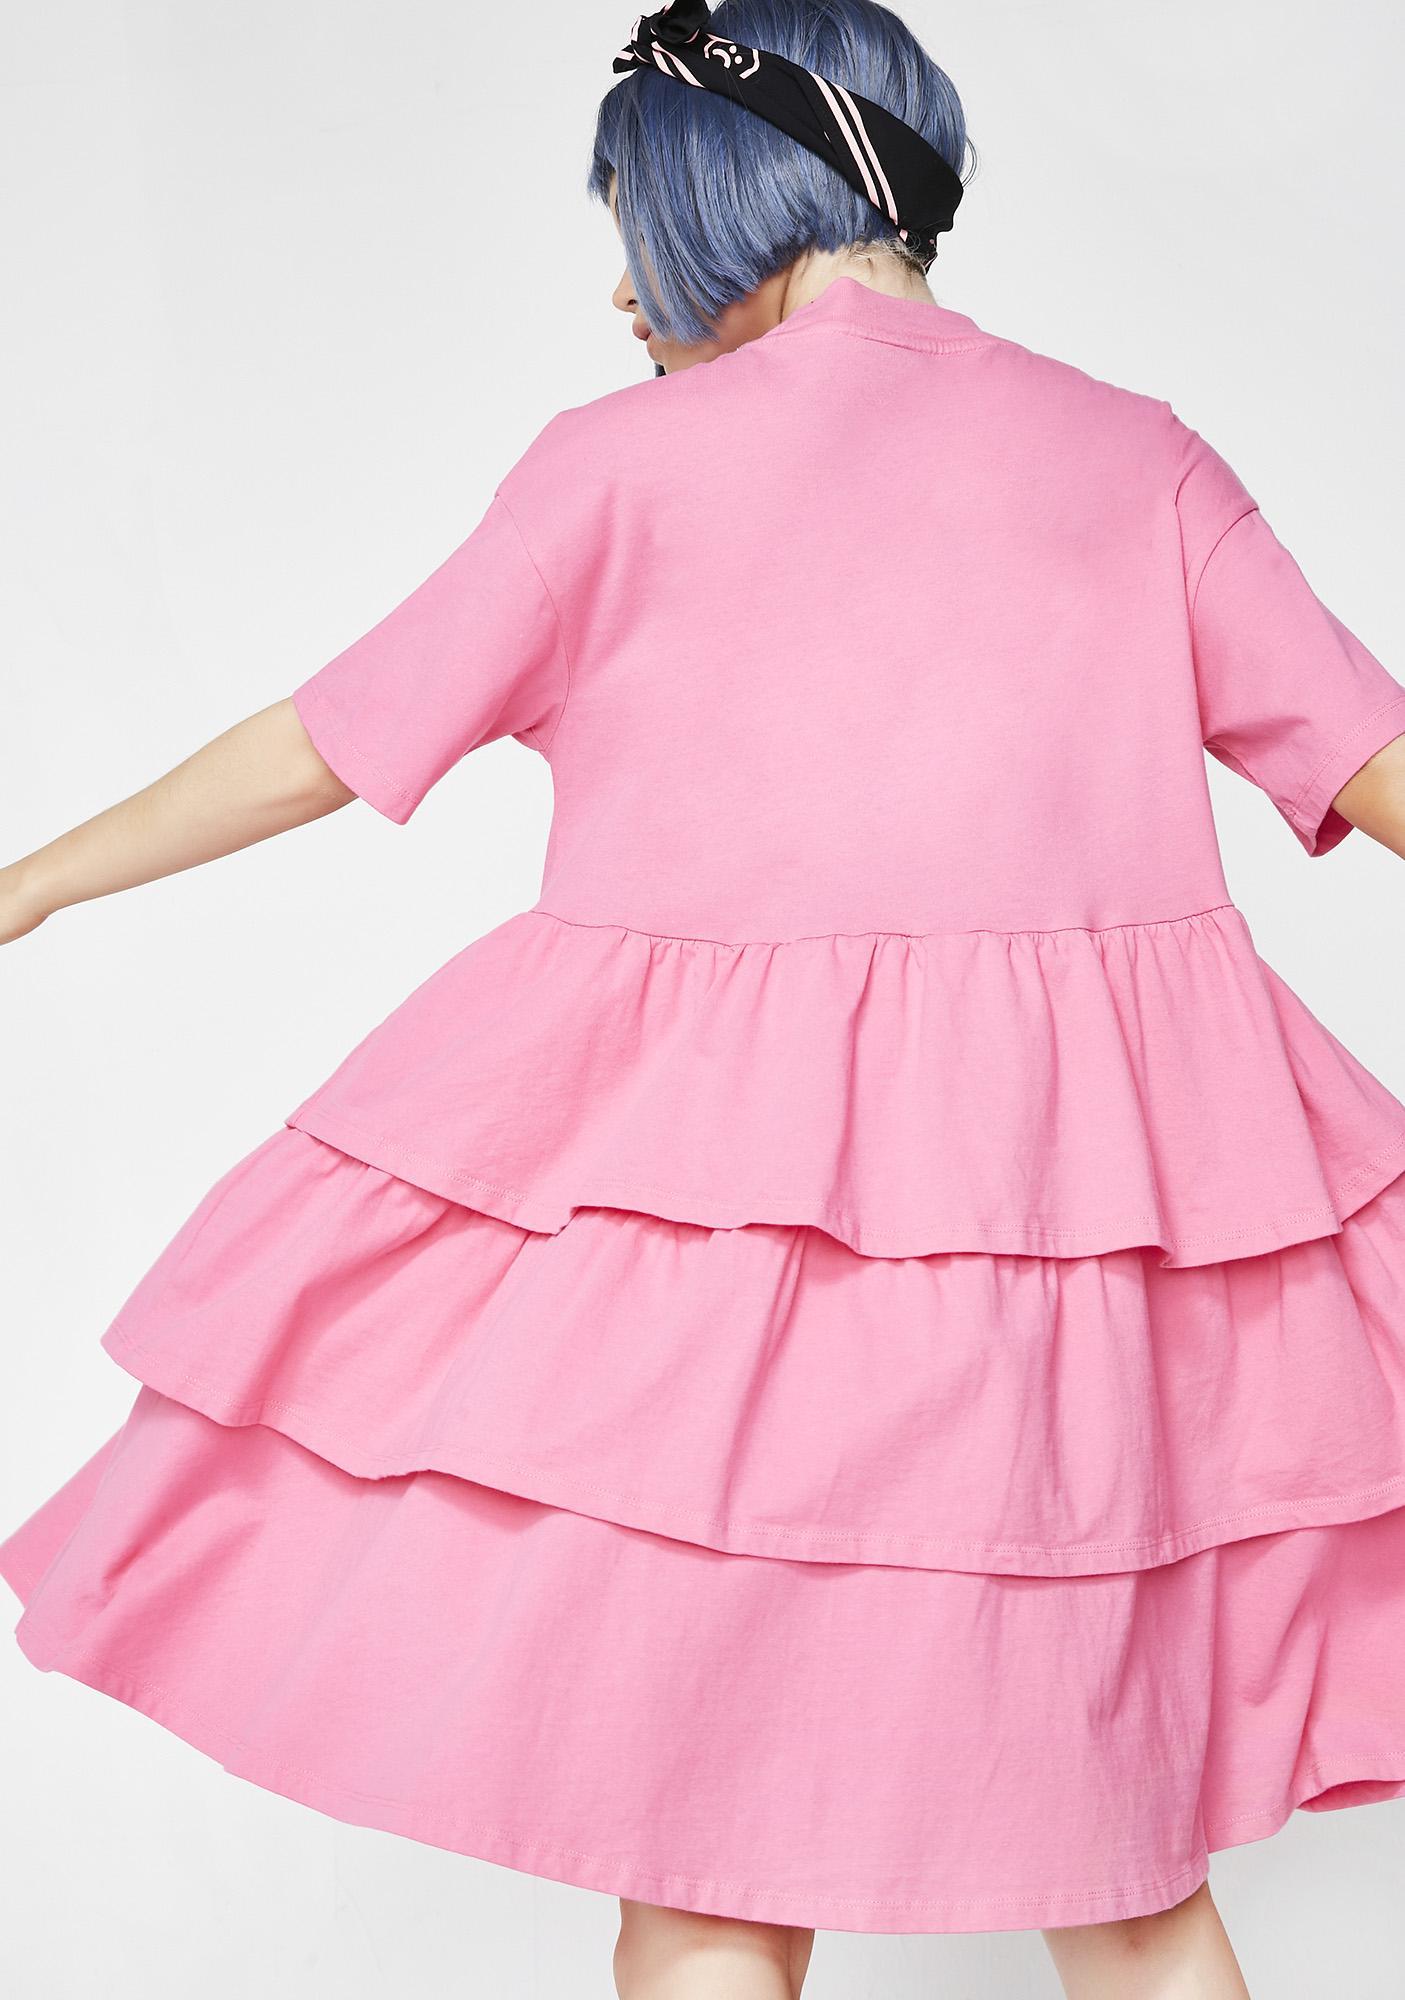 Lazy Oaf Layered Frill Dress